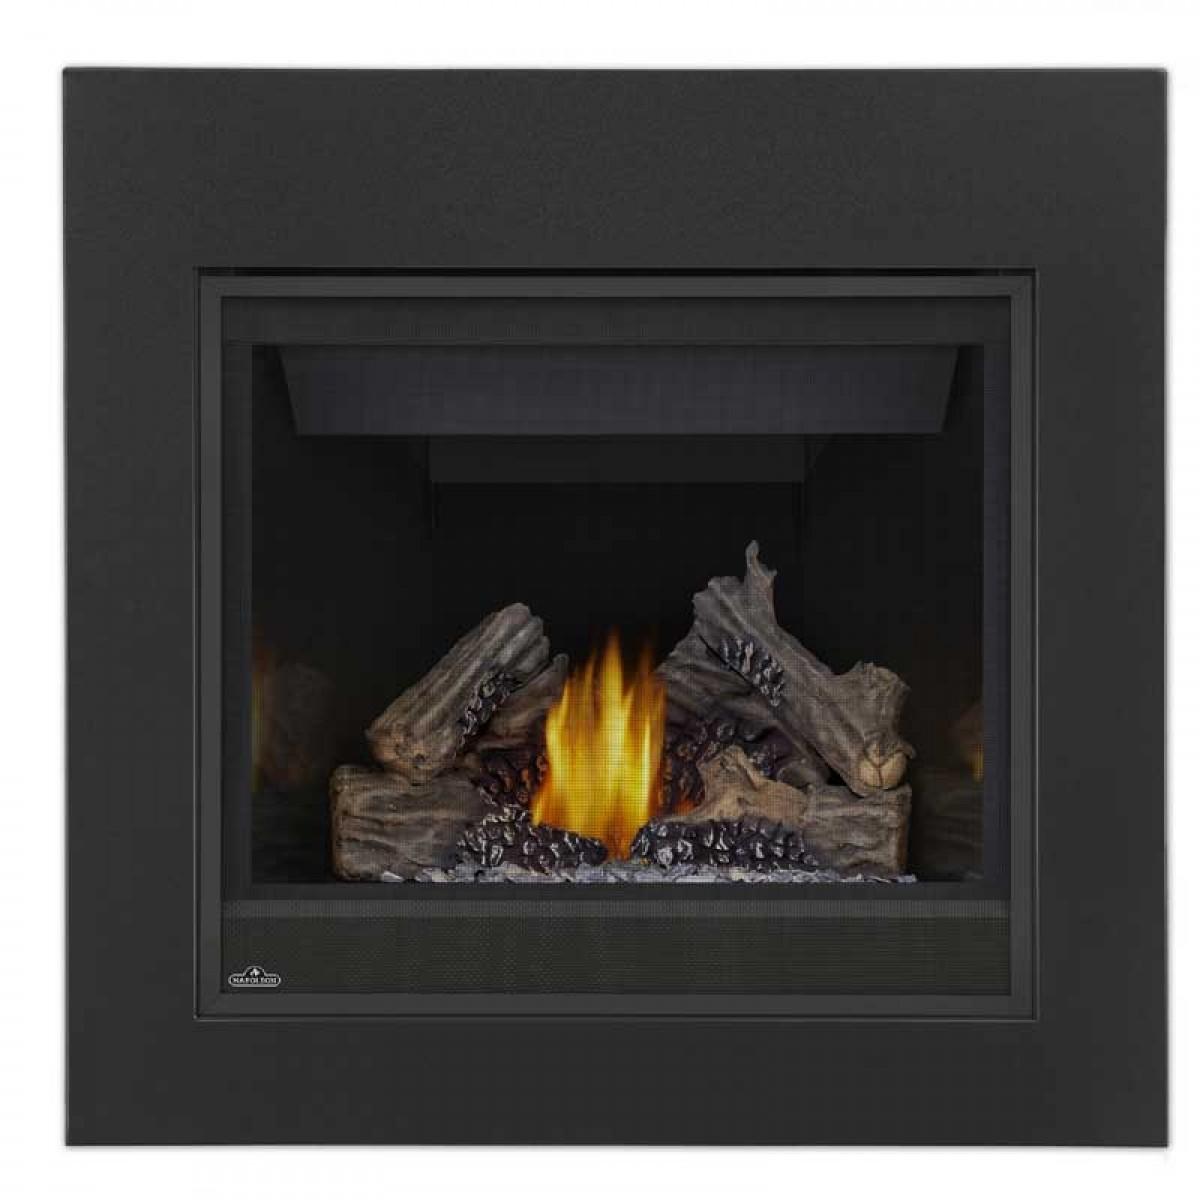 Napoleon B36ntr Ascent 36 Natural Gas Top Rear Vent Fireplace Millivolt At Ibuyfireplaces